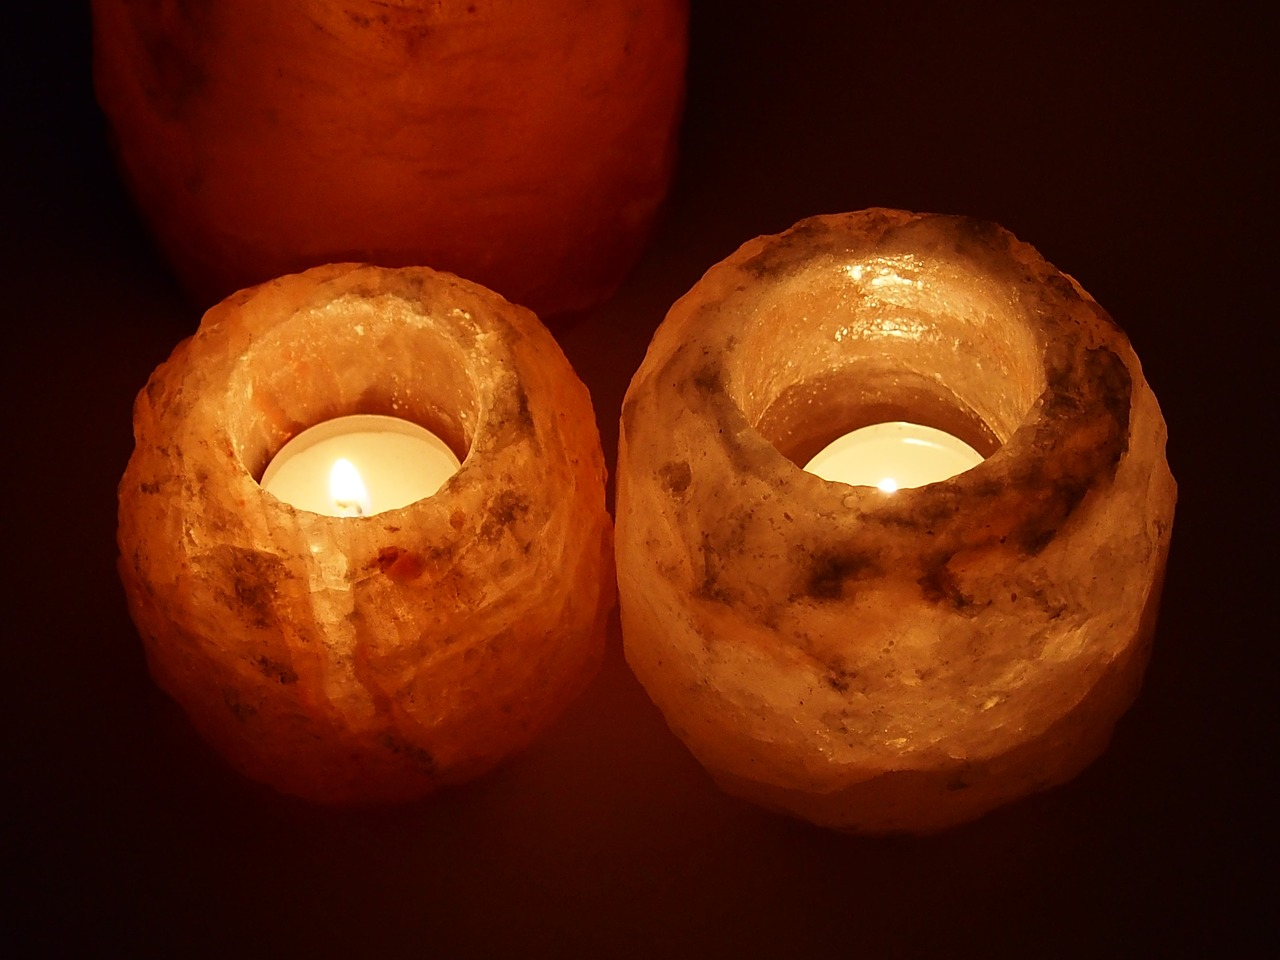 salt-lamps-1047941_1280.jpg